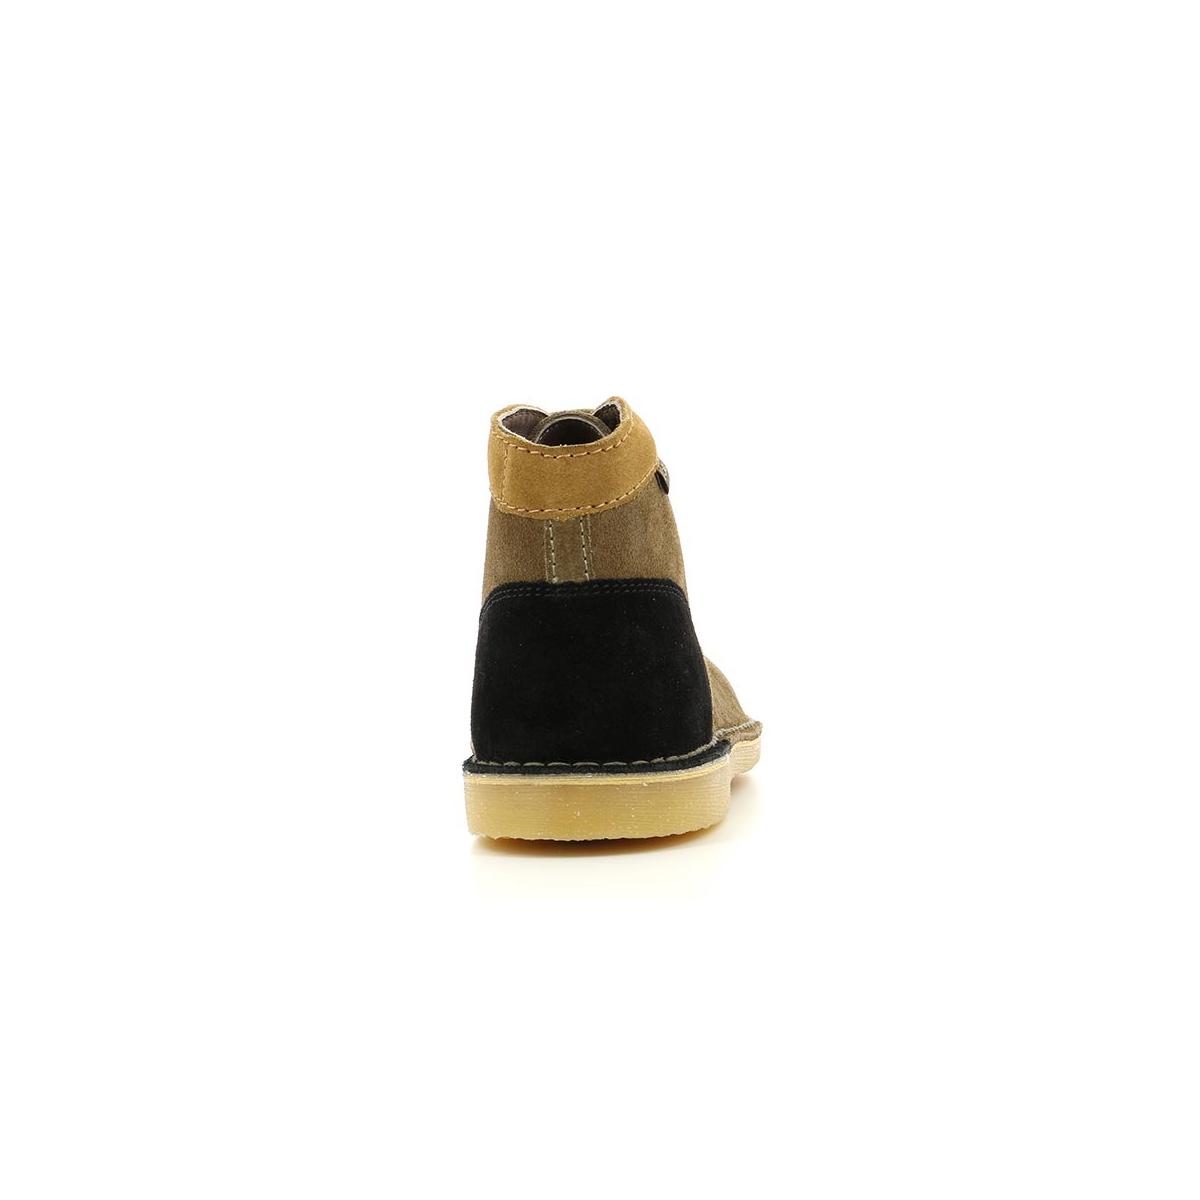 31b834706b76 Femme MARRON NOIR CLAIR Kickers Chaussures BEIGE ORILEGEND xgdq6EgwZ